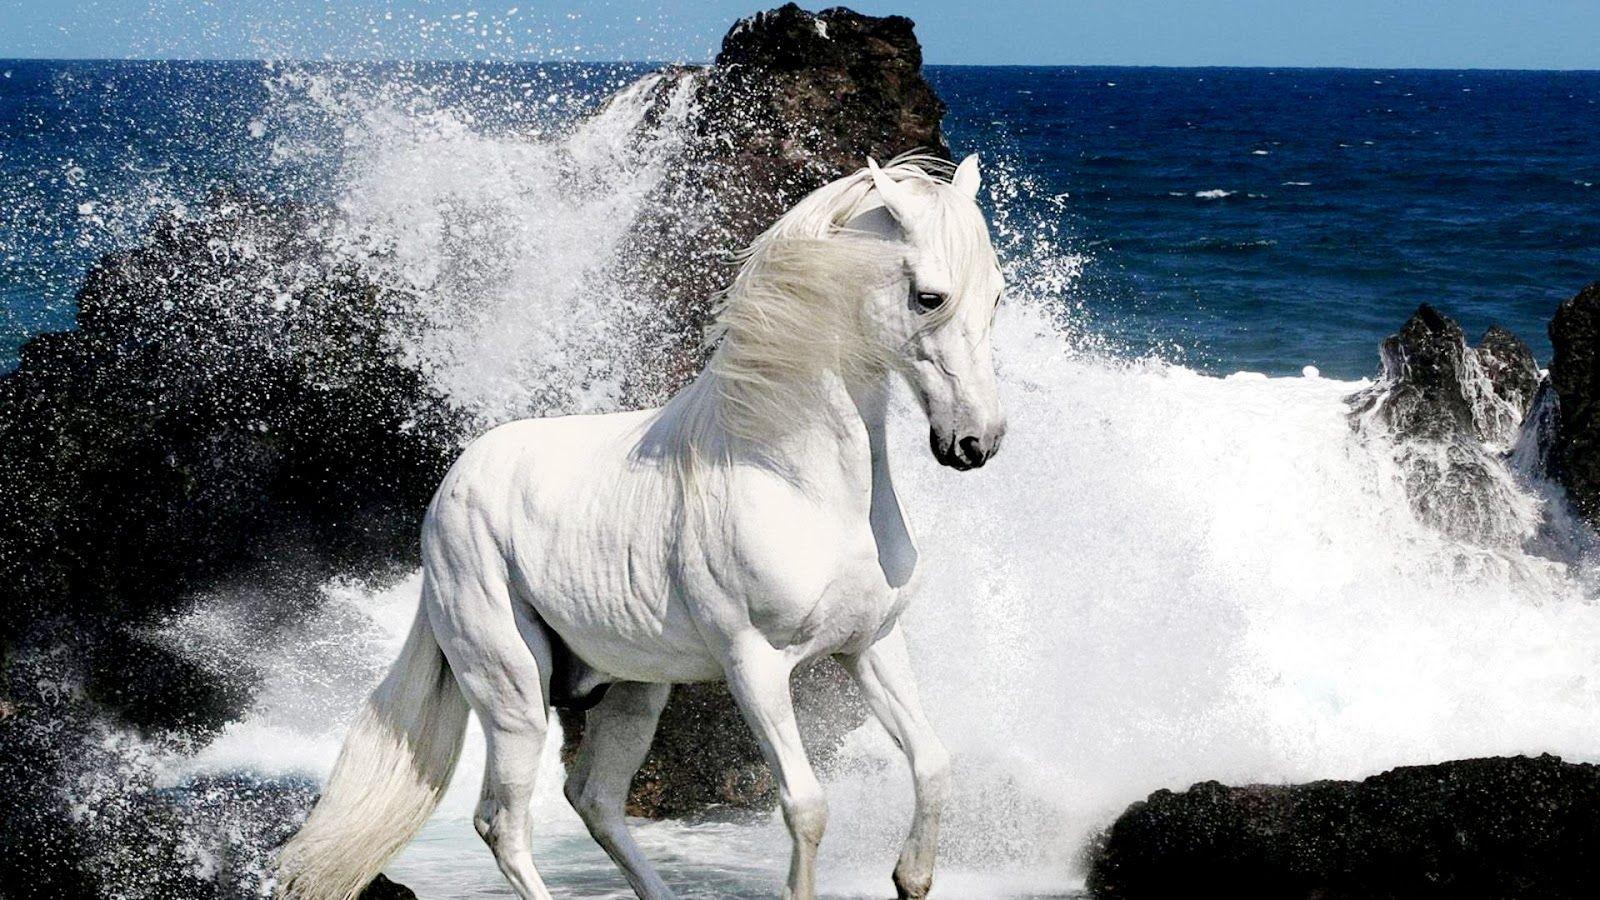 Beautiful Wallpaper Horse Desktop Background - aac0be2bda1cd2439fd7a7fdc2865eaf  You Should Have_485685.jpg